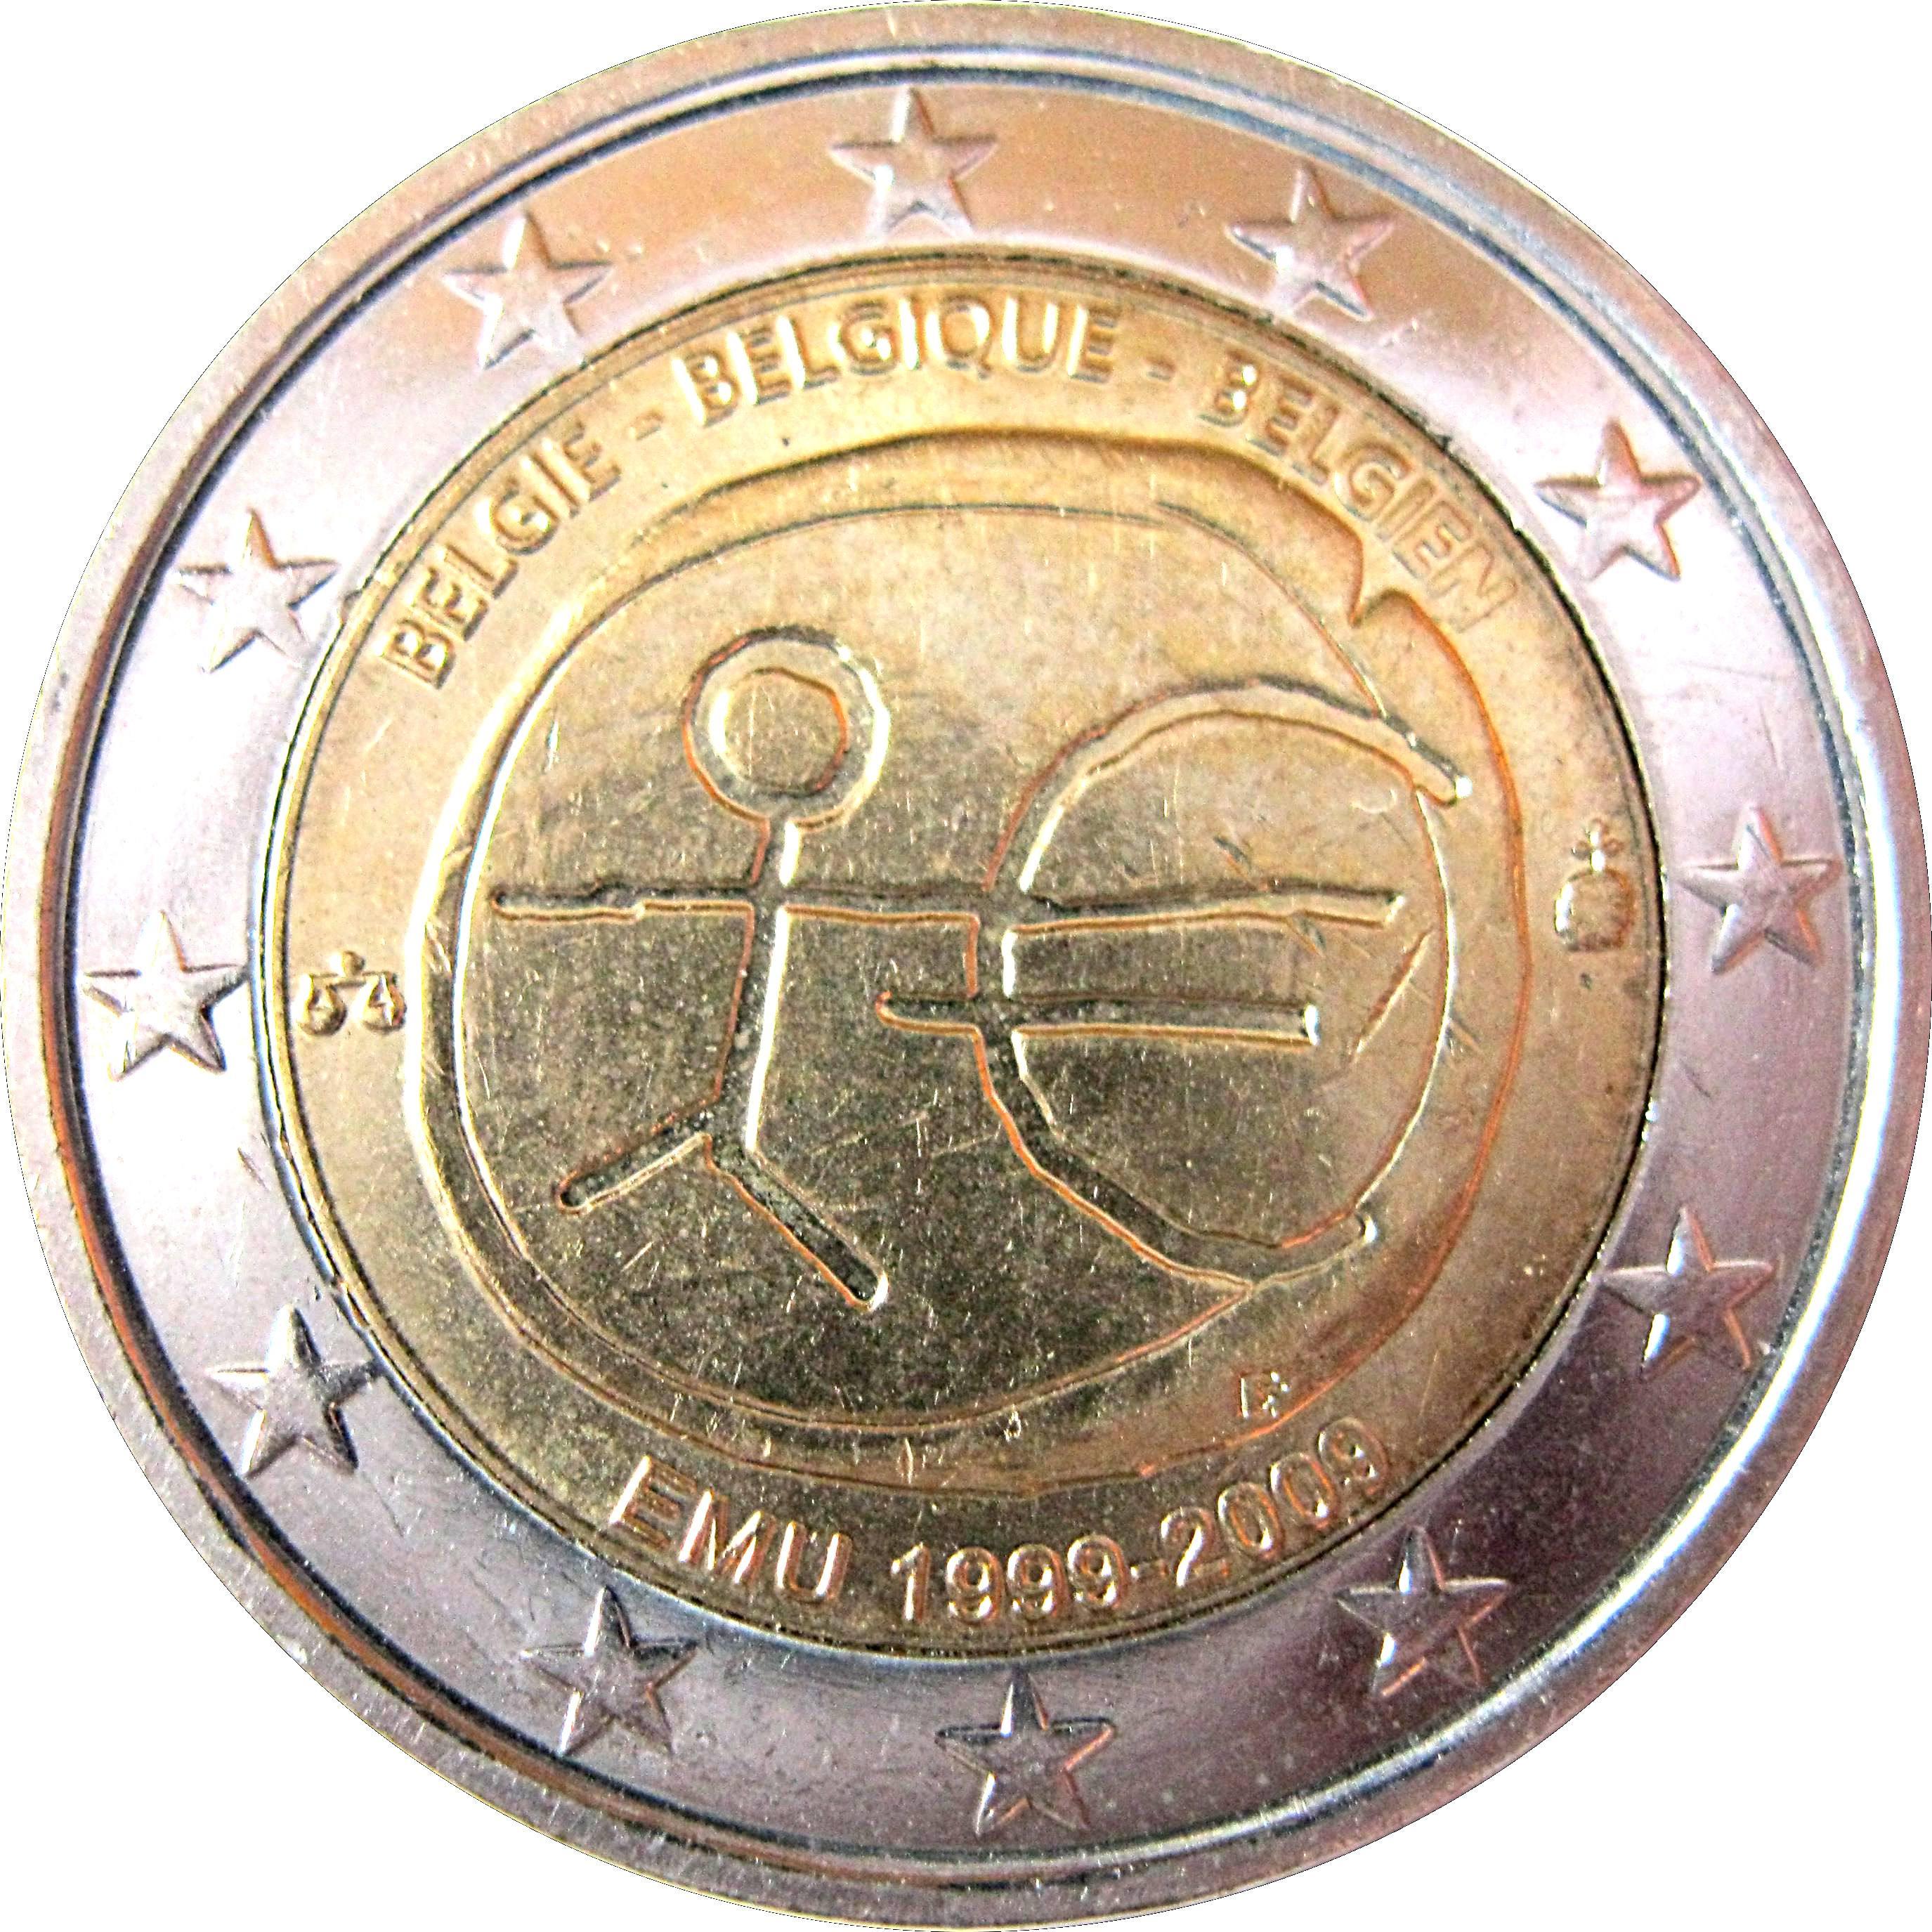 NETHERLAND 2 EURO coin 2009 10 Years EMU Birth of Euro UNC bimettalic 2 €